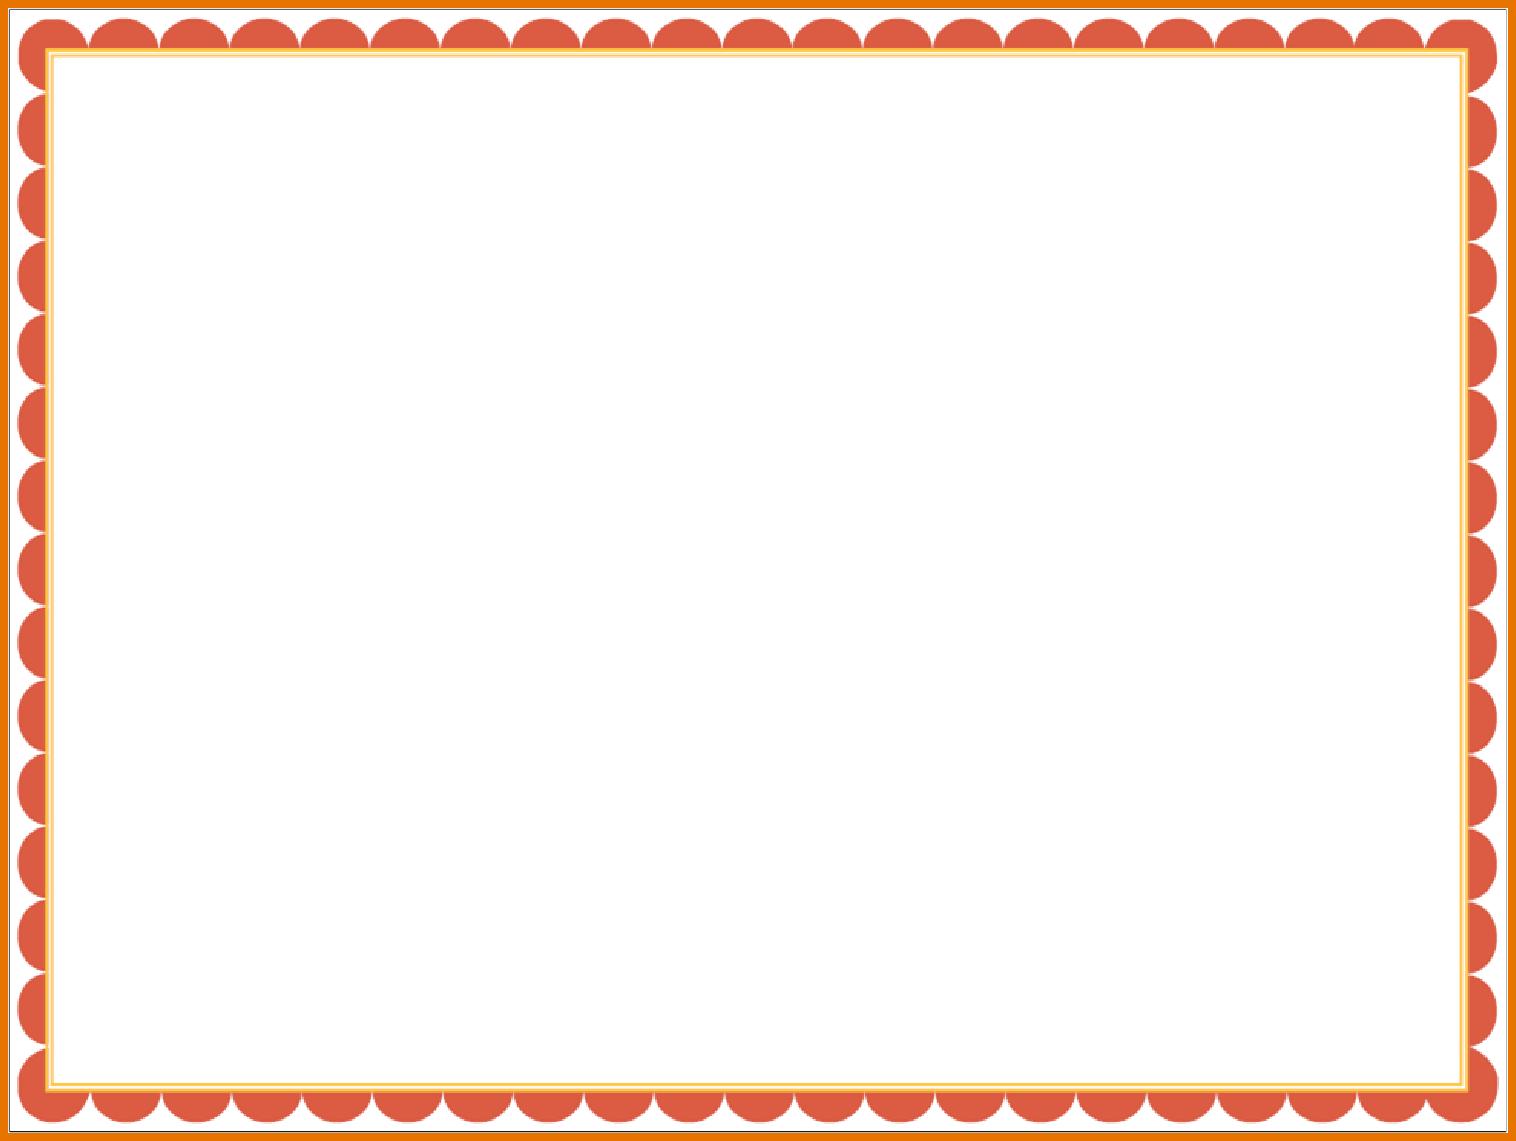 PNG Certificate Borders Free Transparent Certificate Borders.PNG.